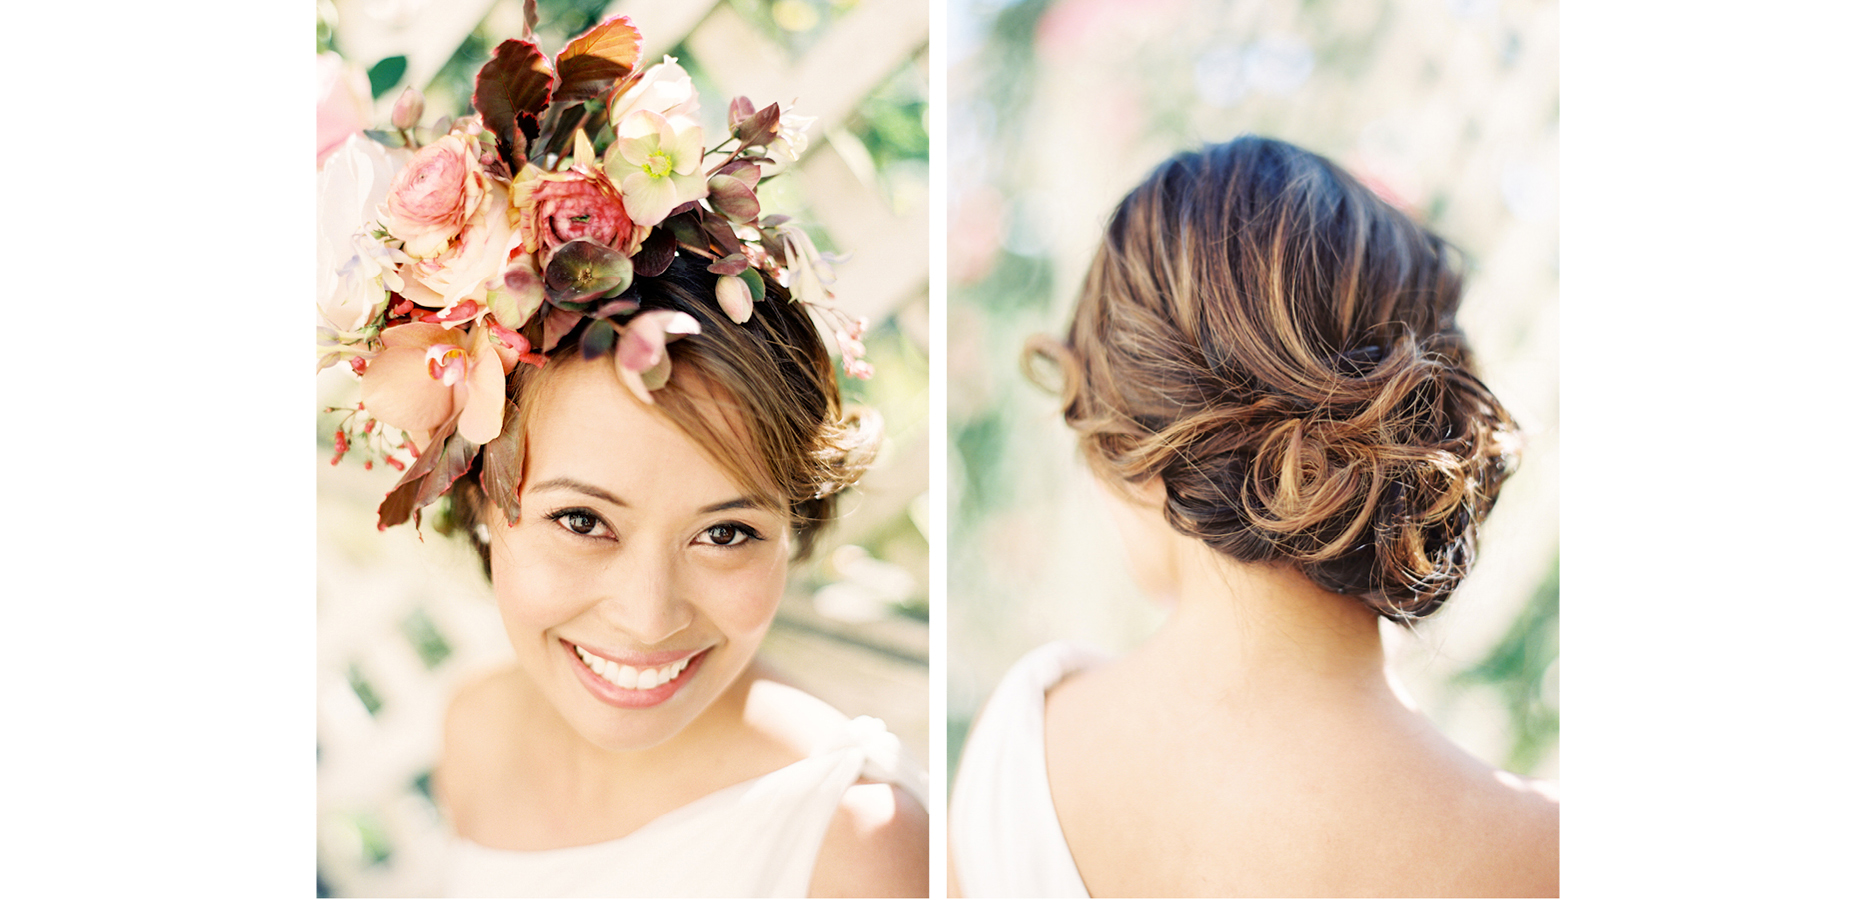 Jess-Wilcox-Hair-Makeup-Wedding_portfolio10.jpg